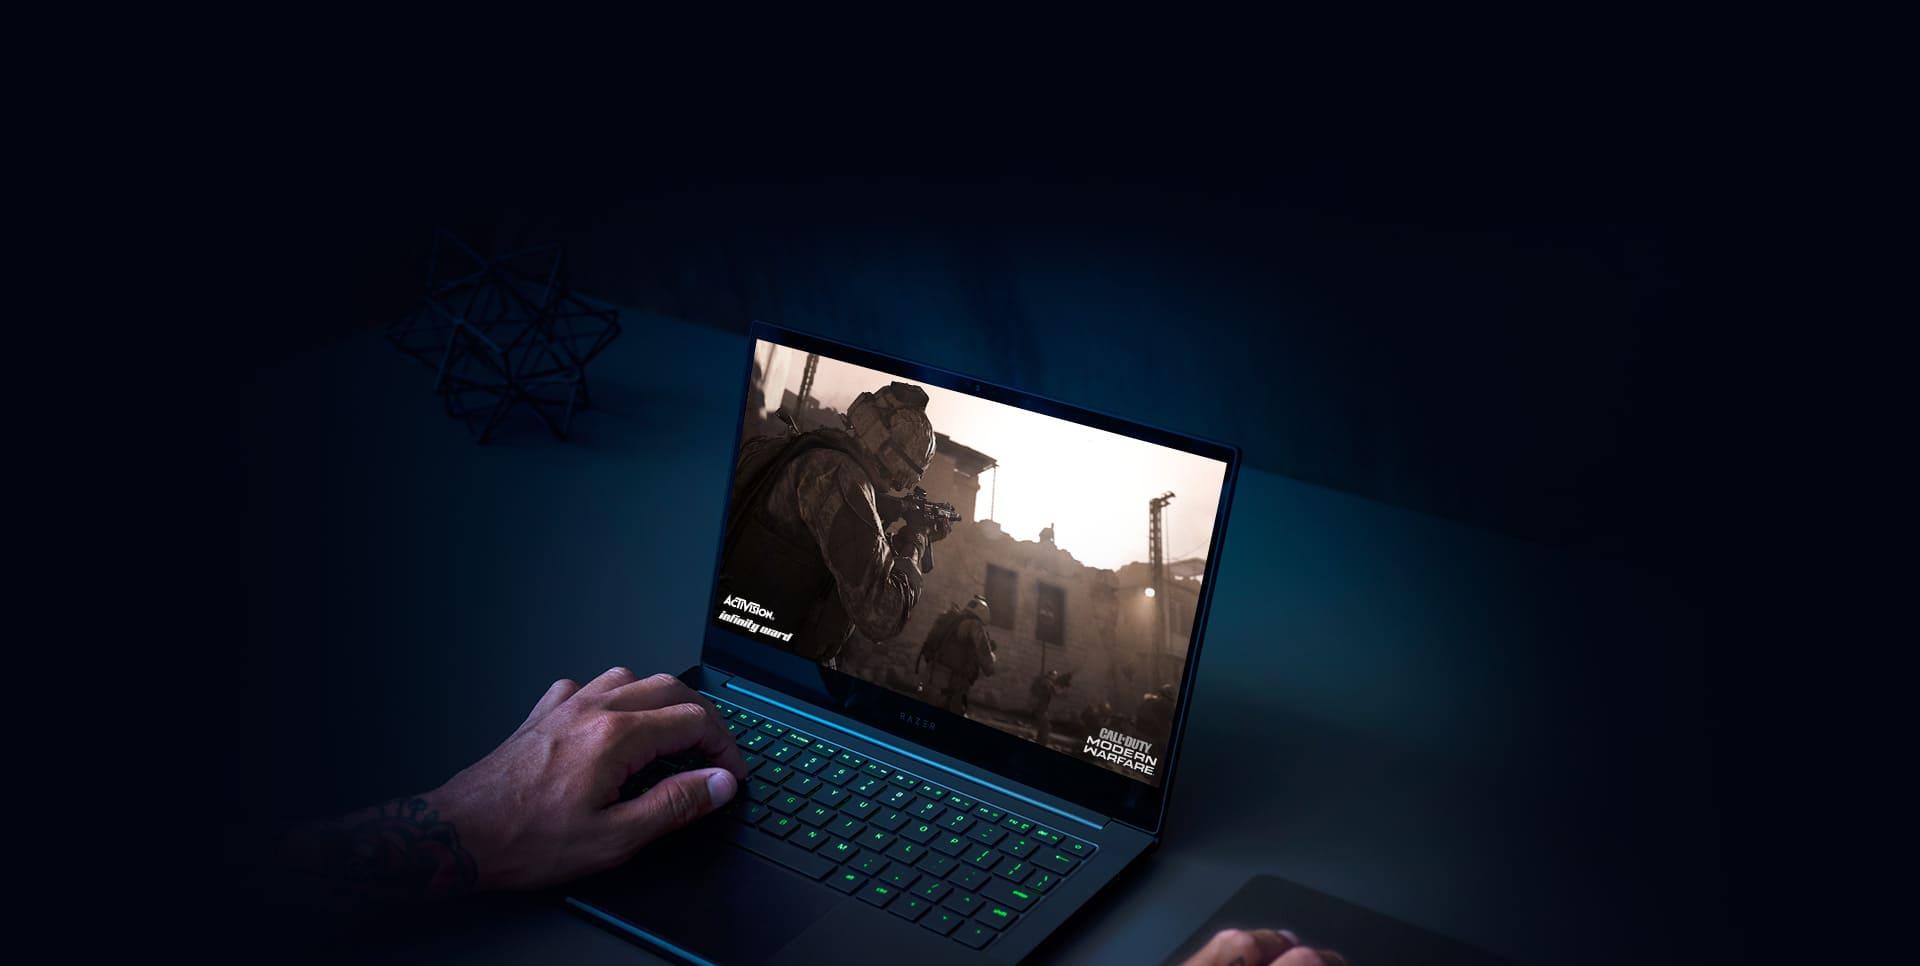 erstes Gaming-Ultrabook mit der Nvidia GTX 1650